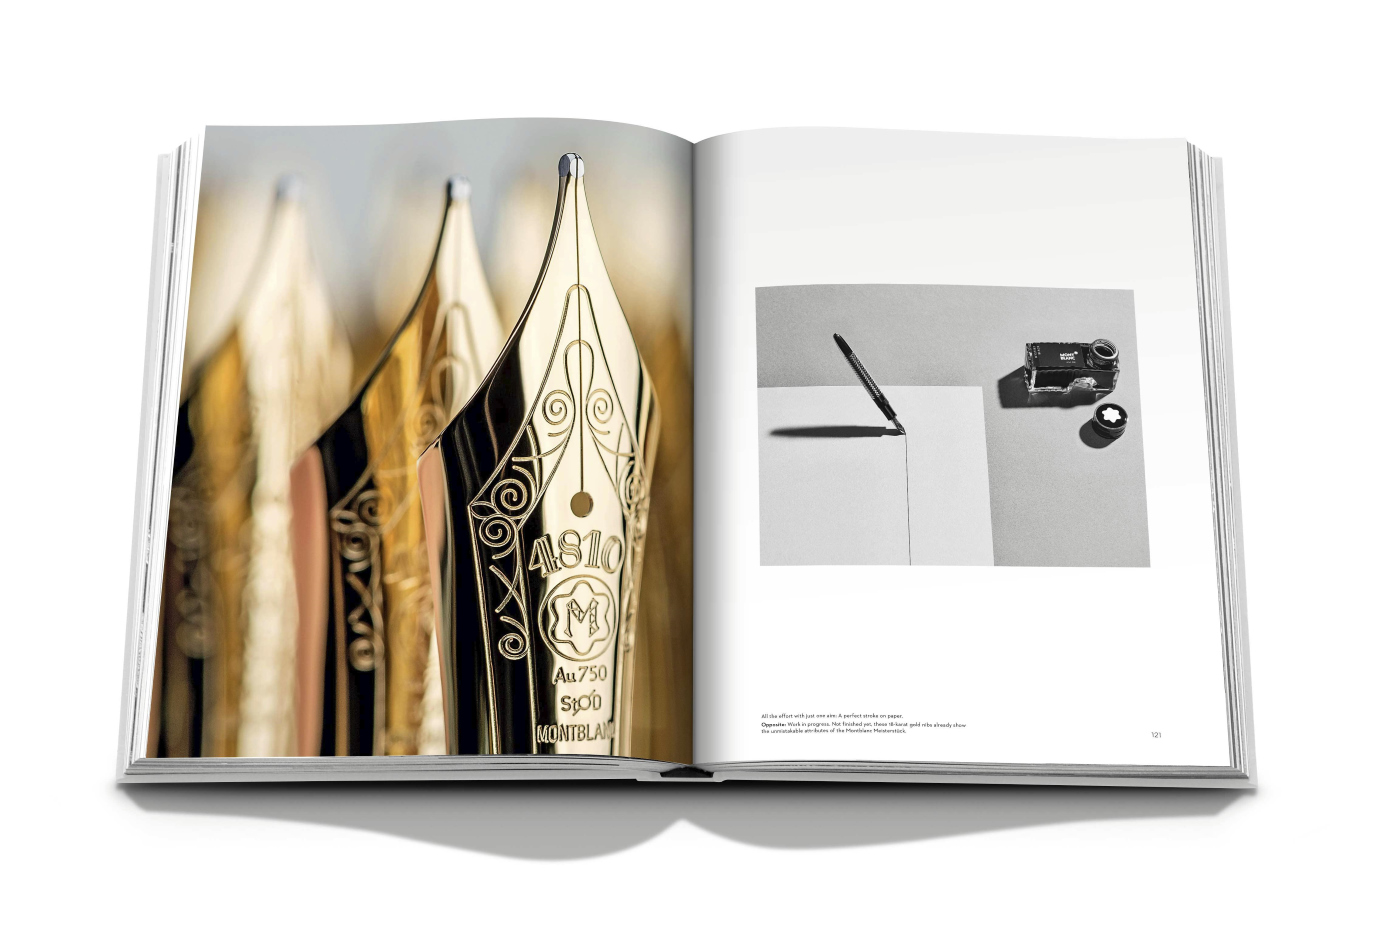 montblanc_inspire_writing_spread_6_-_europa_star_magazine_2021